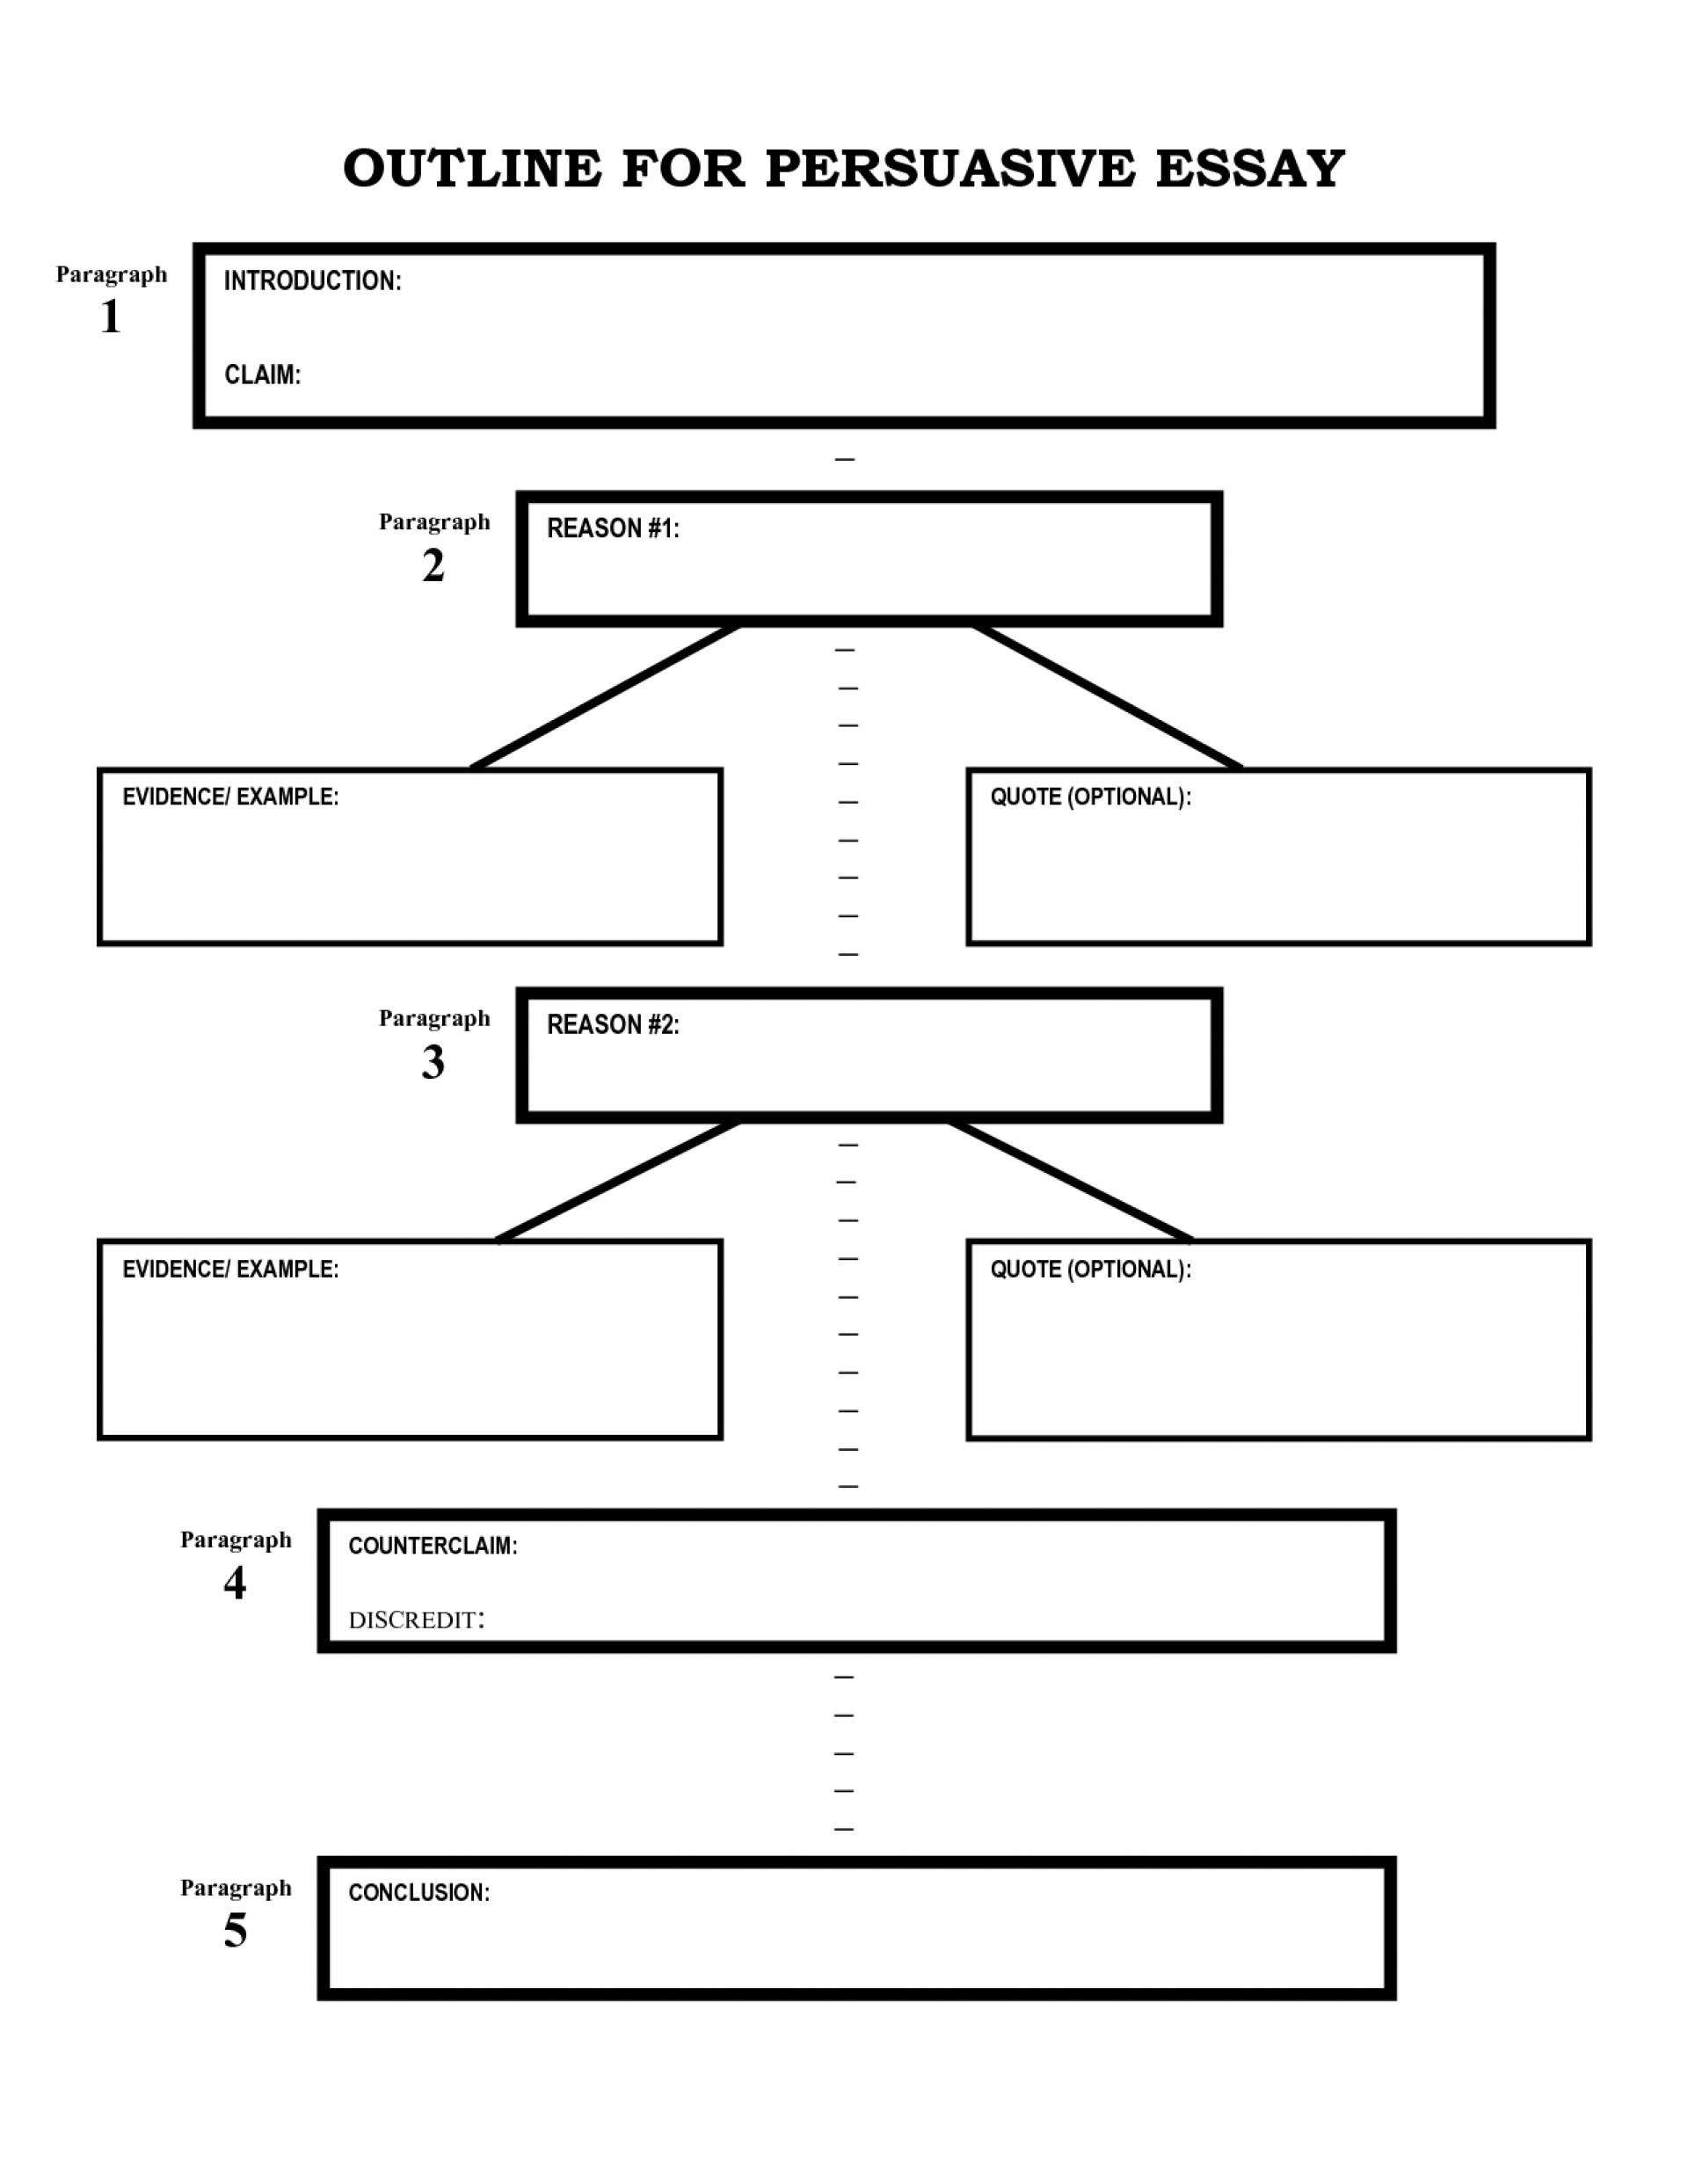 011 Outline For Persuasive Essay Stirring Argumentative Middle School Writing 1920